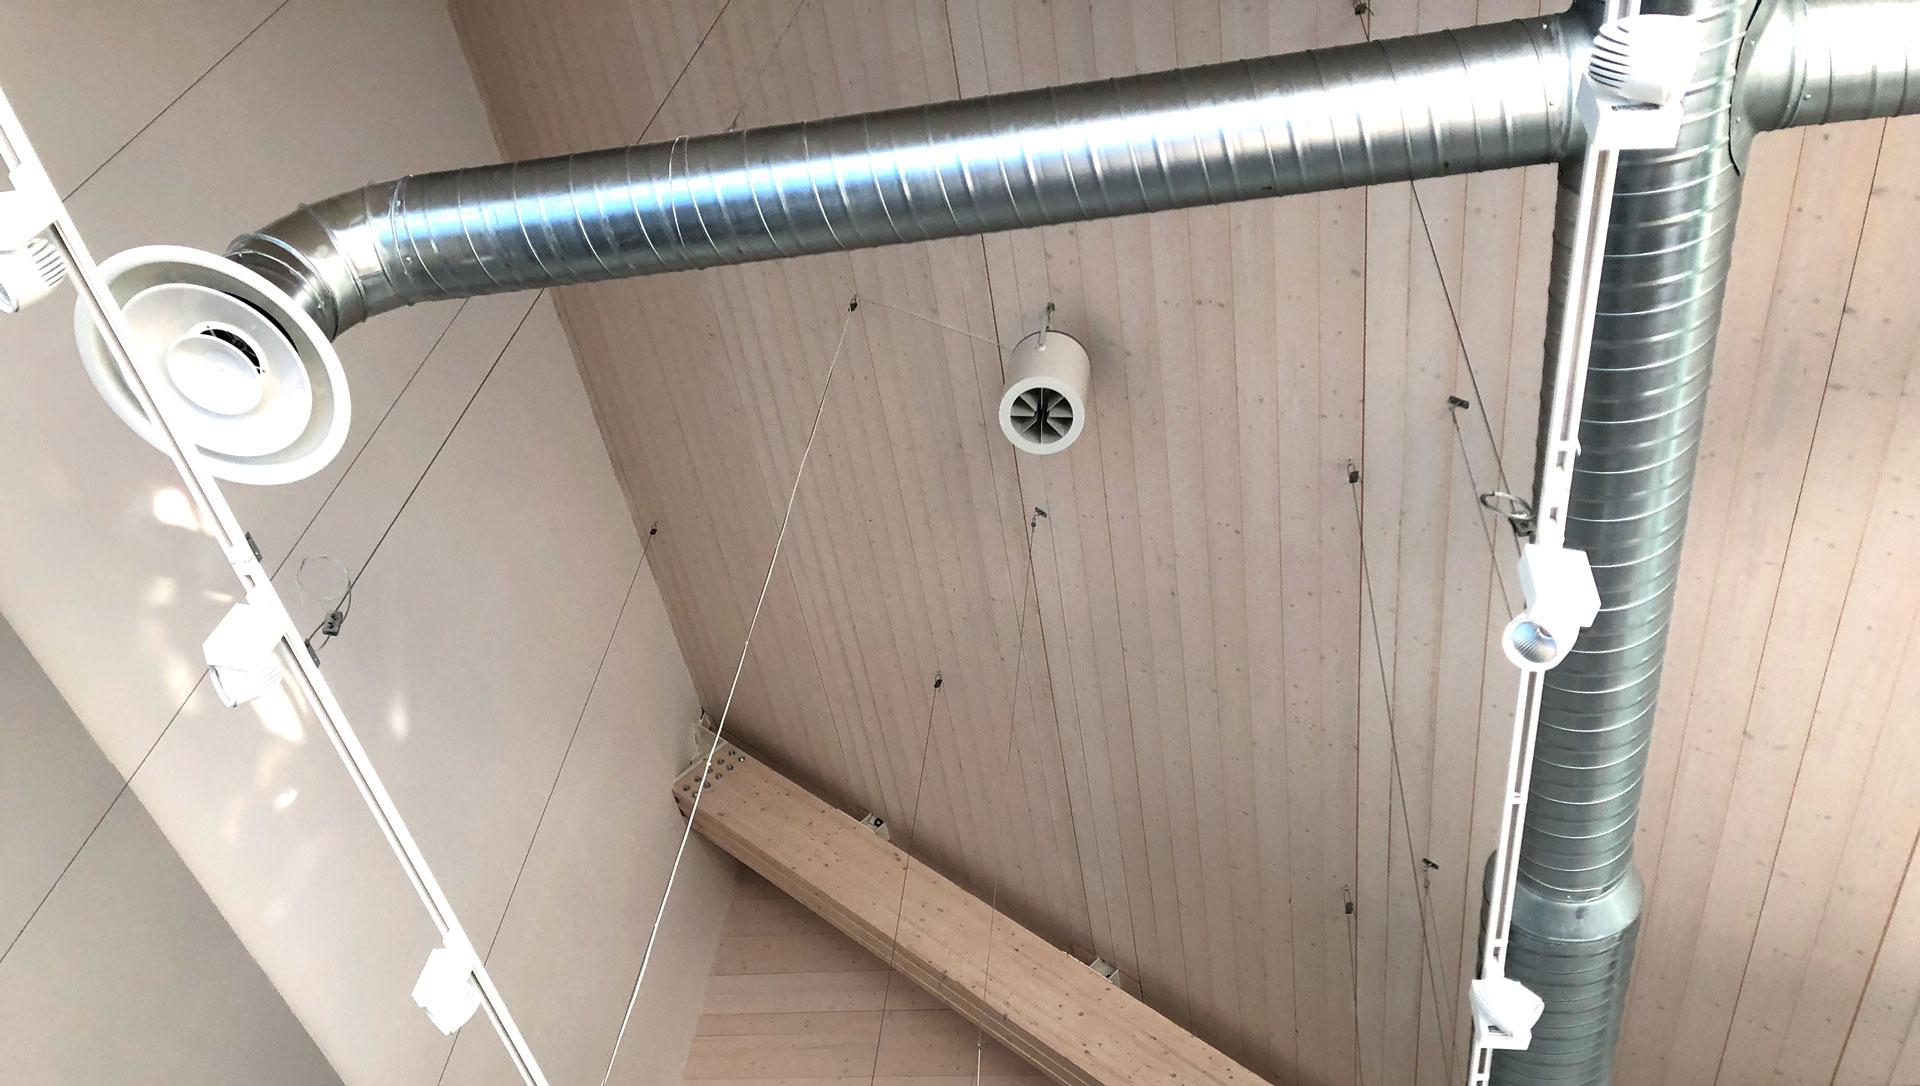 Airius Destratification Fan System 1